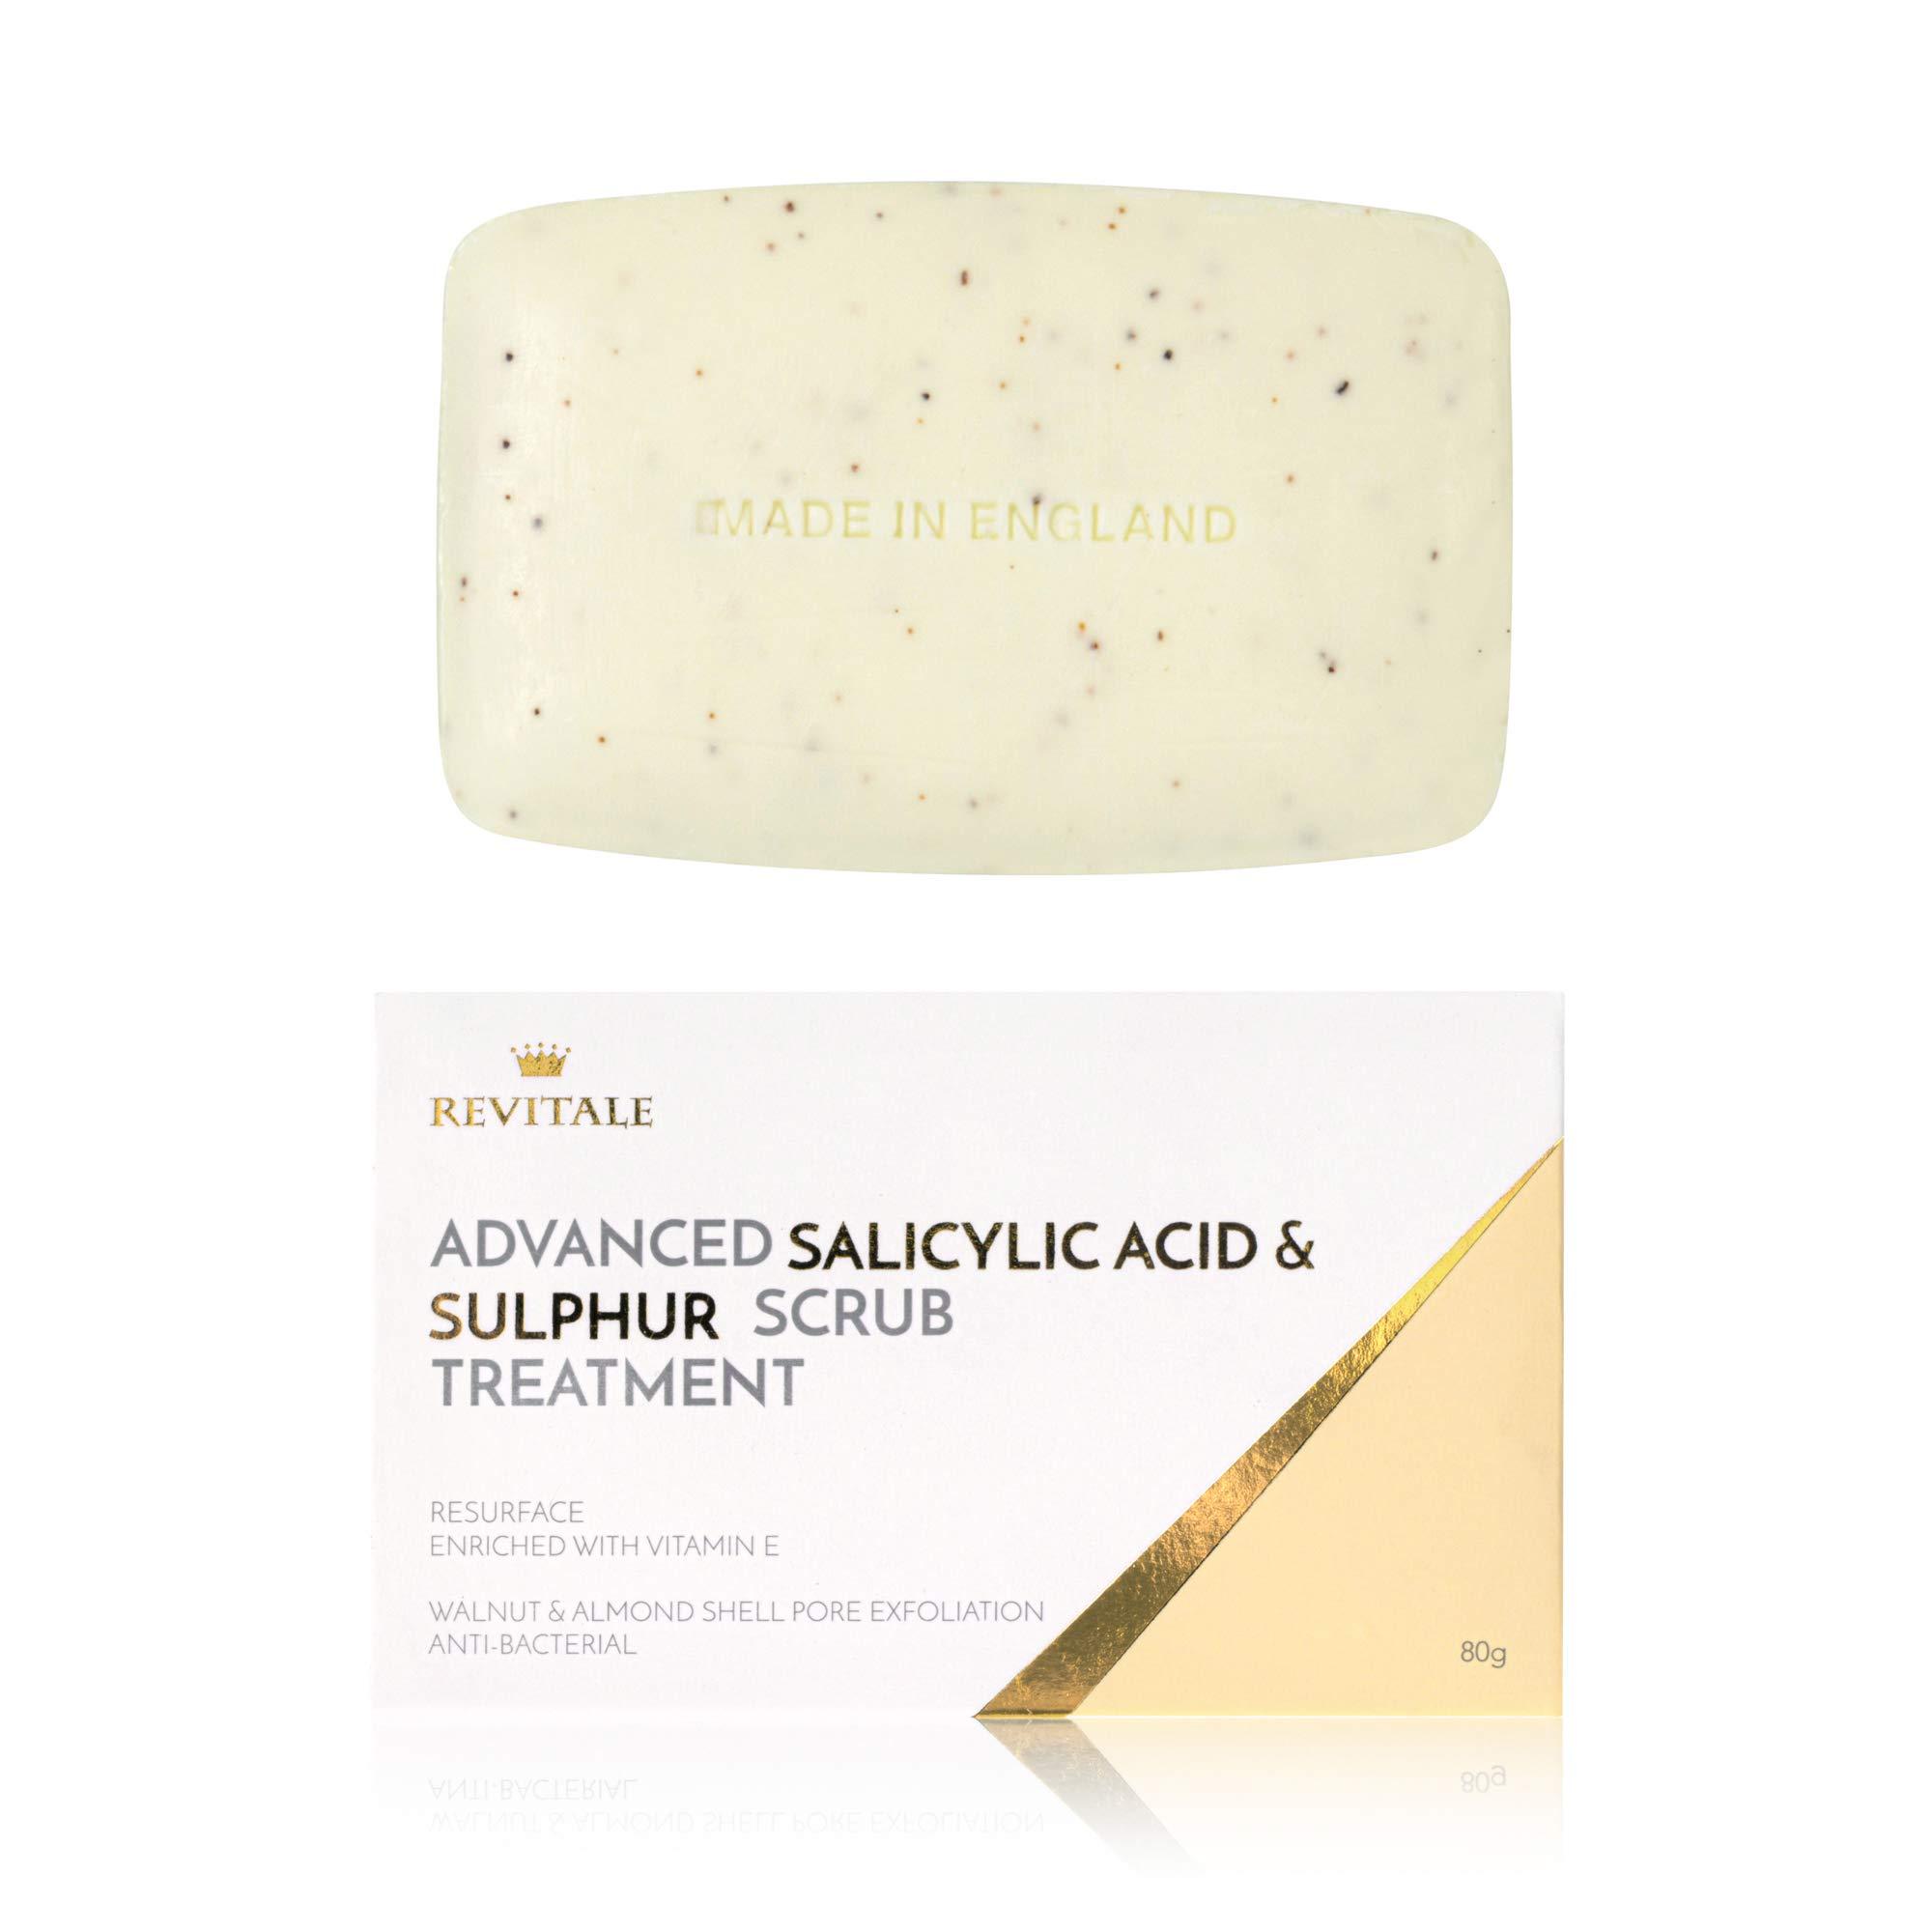 Revitale Advanced Salicylic Acid & Sulphur Scrub Treatment Soap